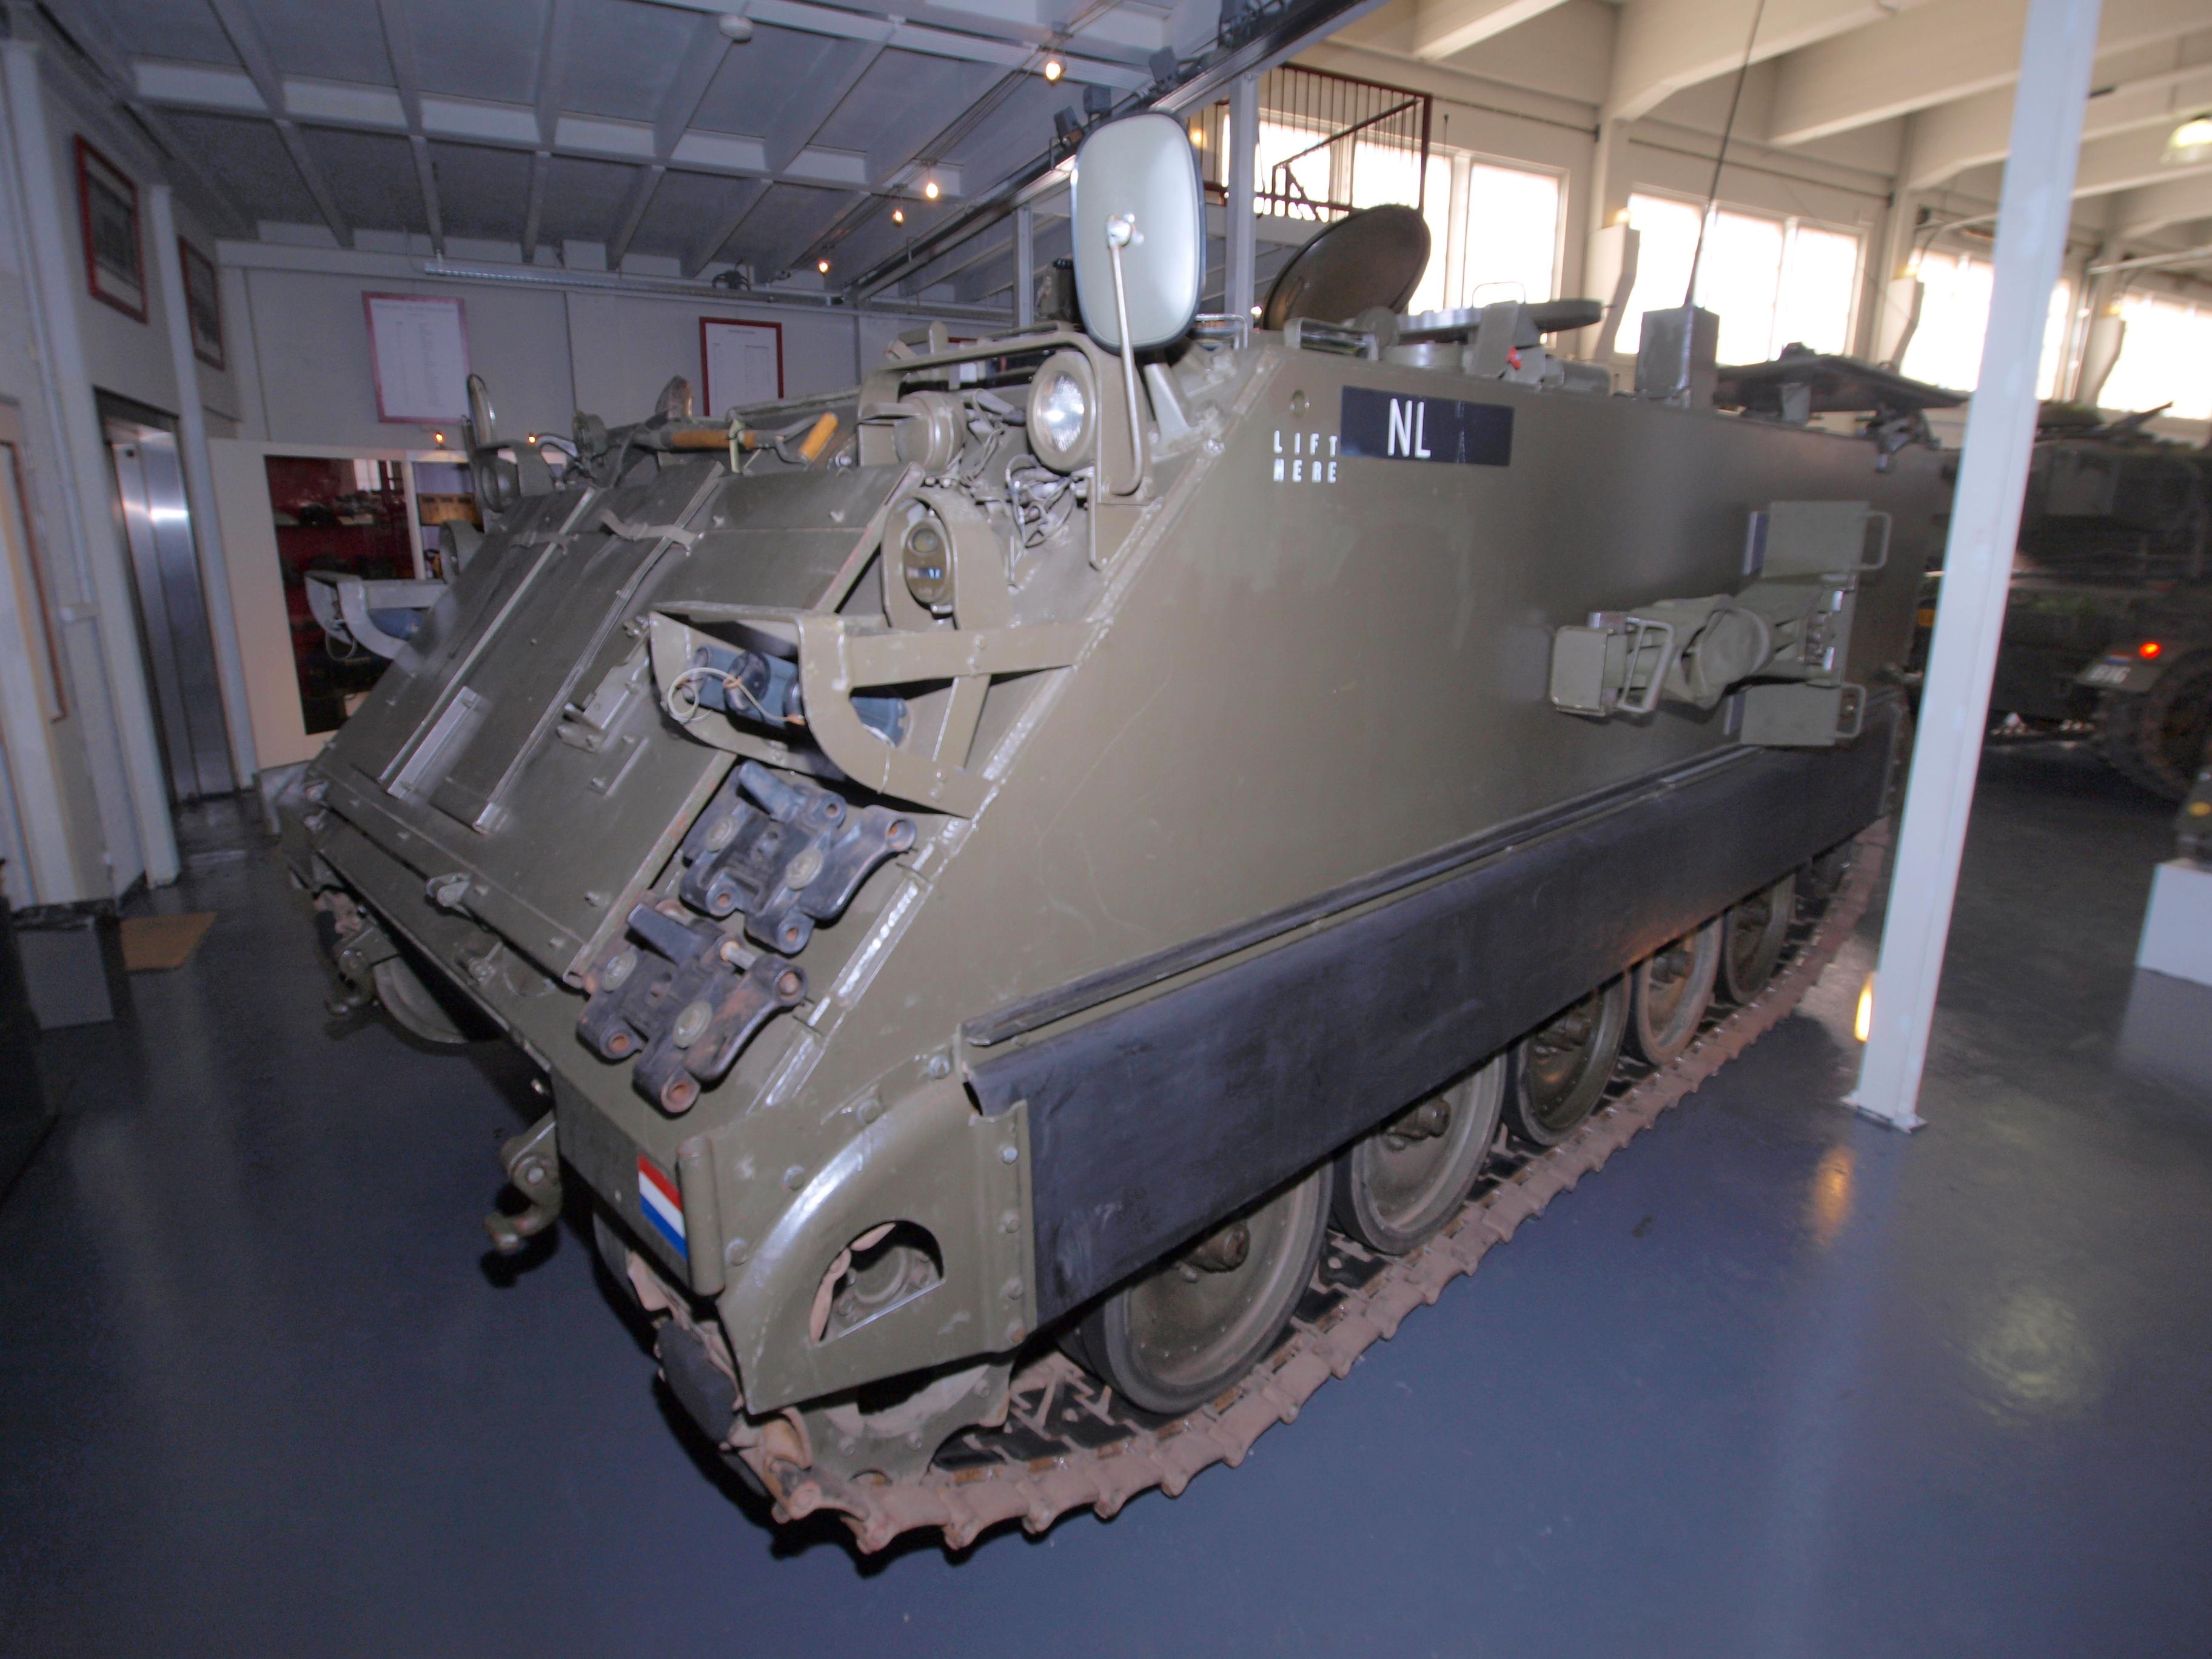 Military Mortar Sizes : File m mortar carrier dutch army ku pic